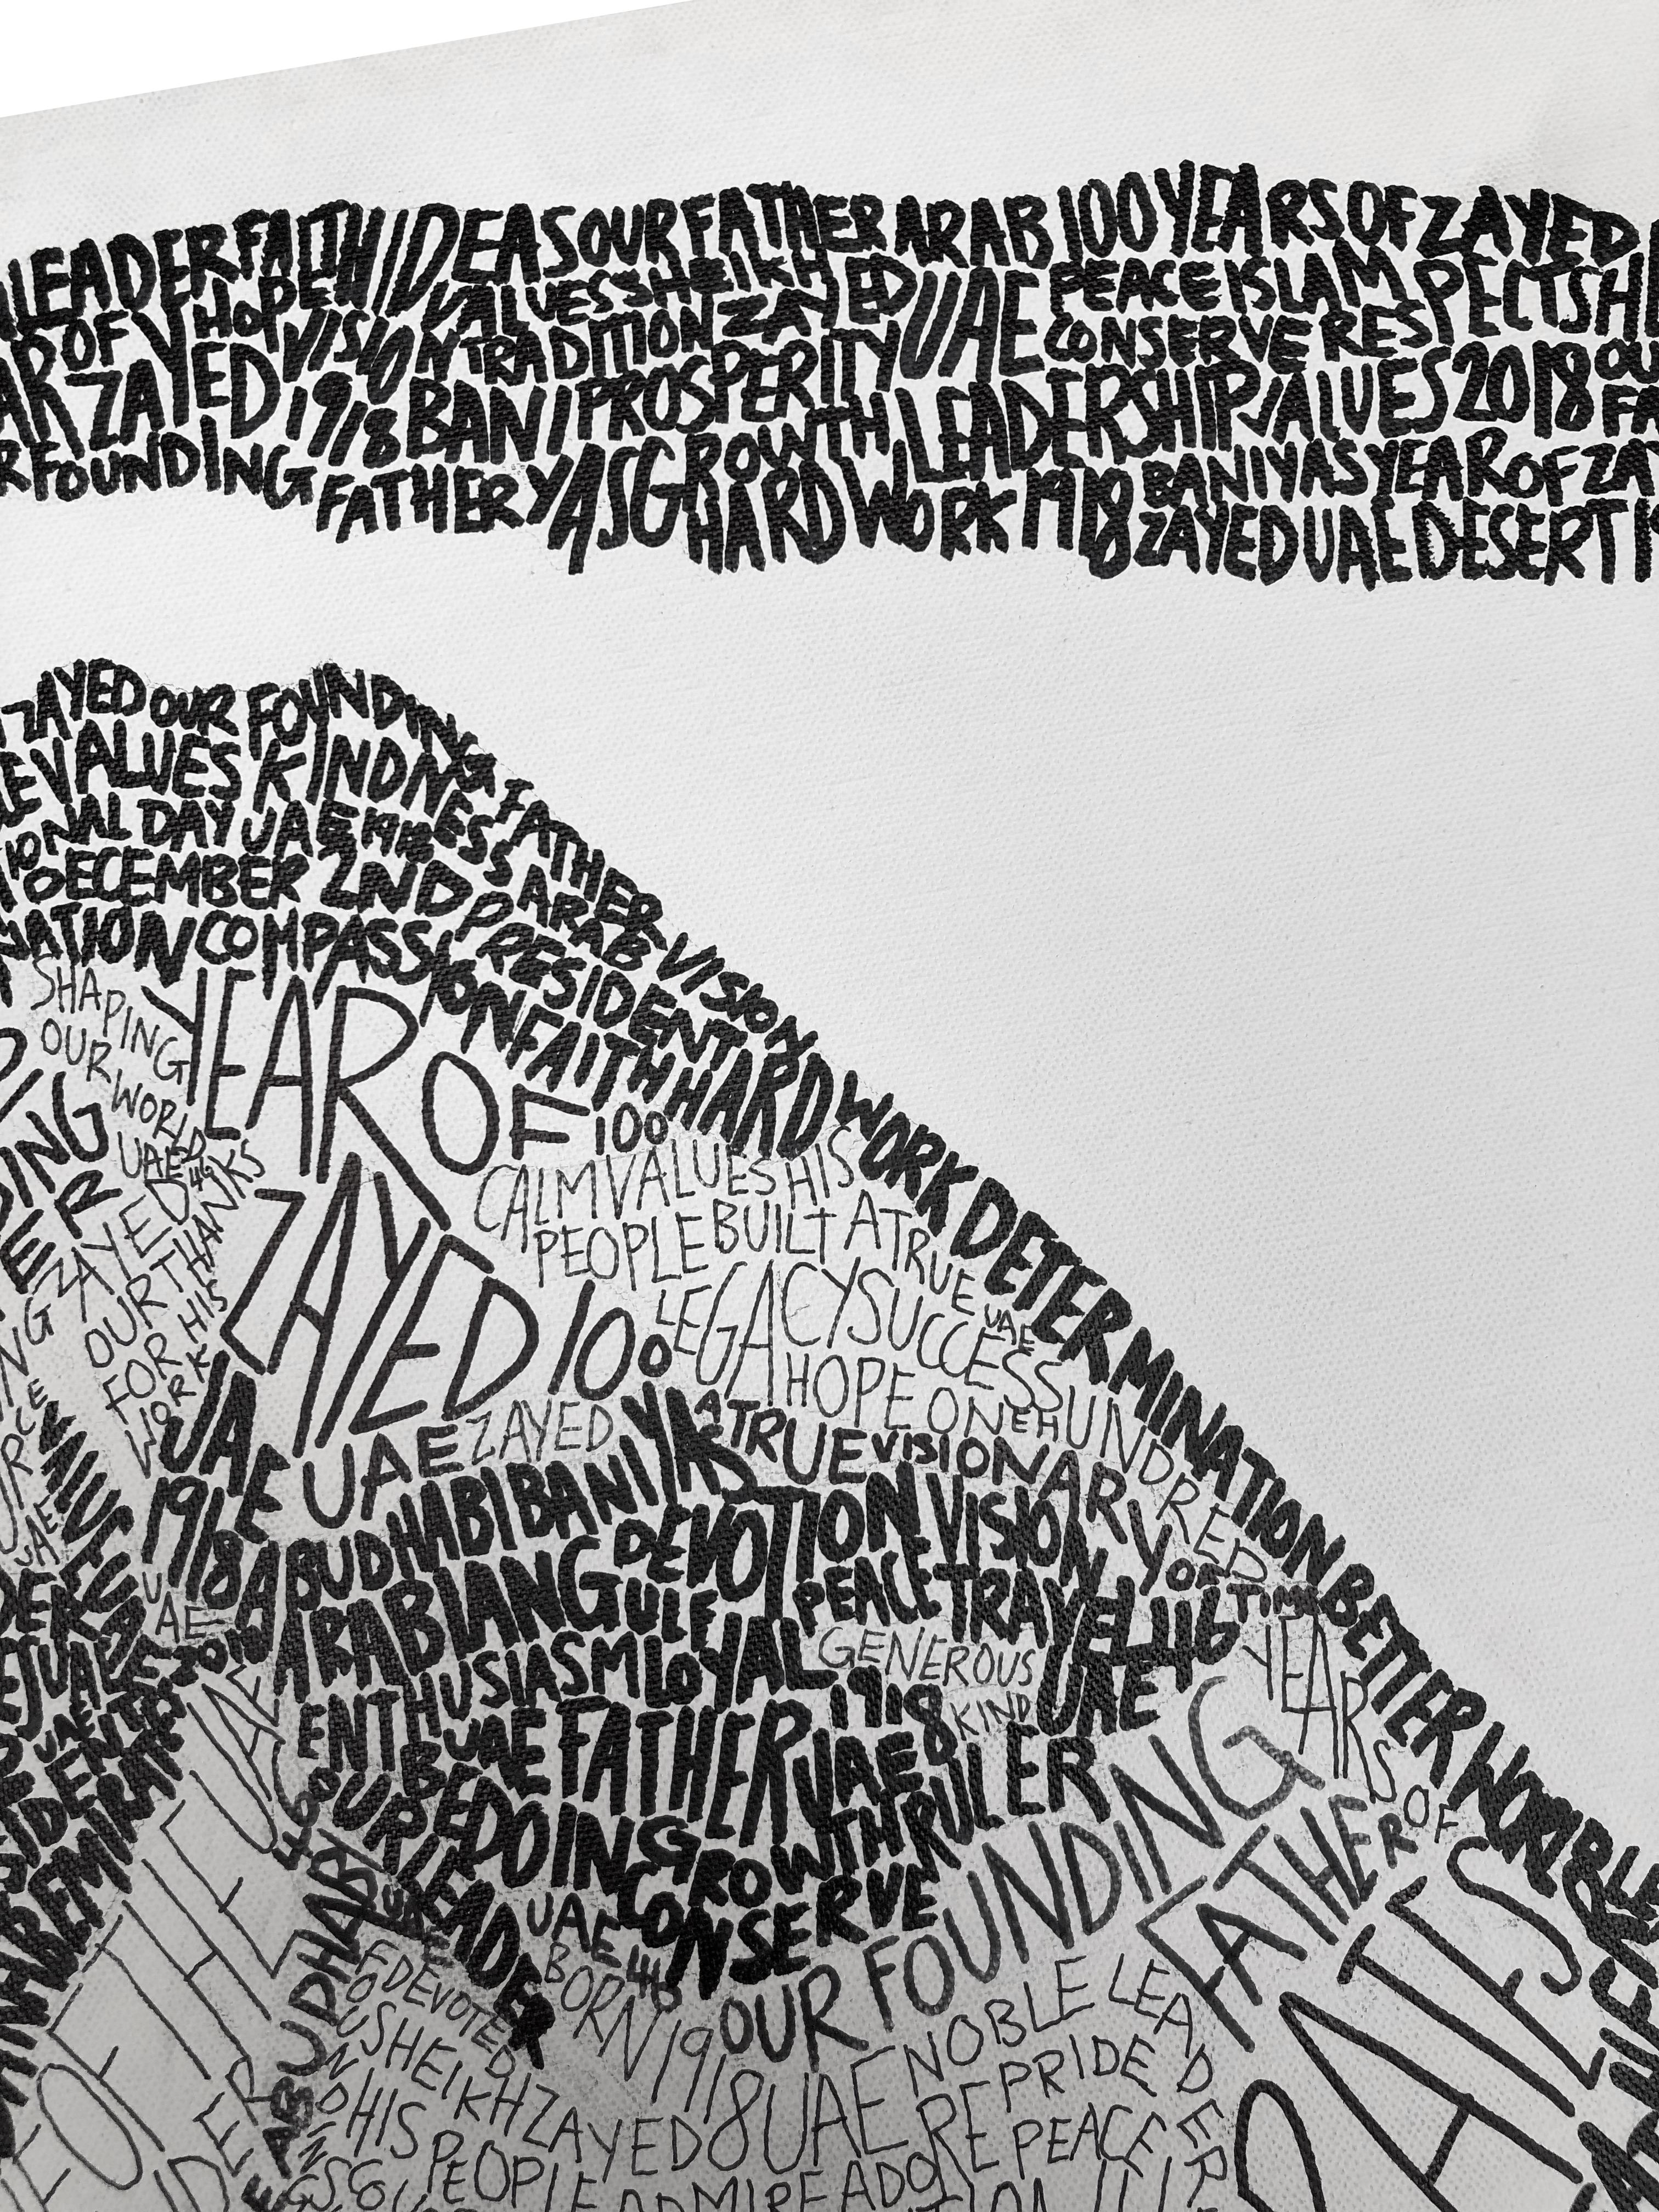 Story Of A Leader 2 Natalie Daghestani Art Dubai Artist BSAB 2